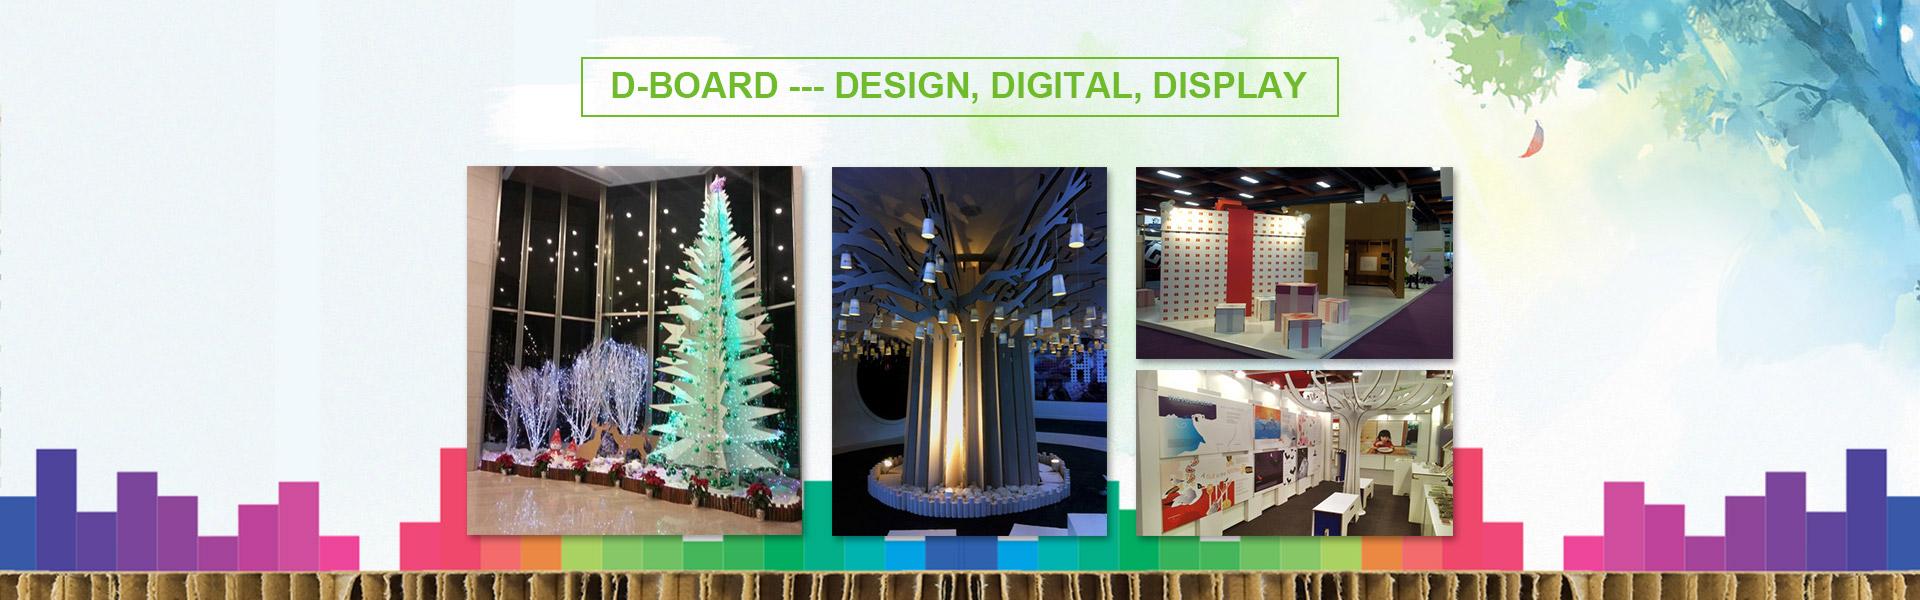 D-BOARD---DESIGN,DIGITAL,DISPLAY